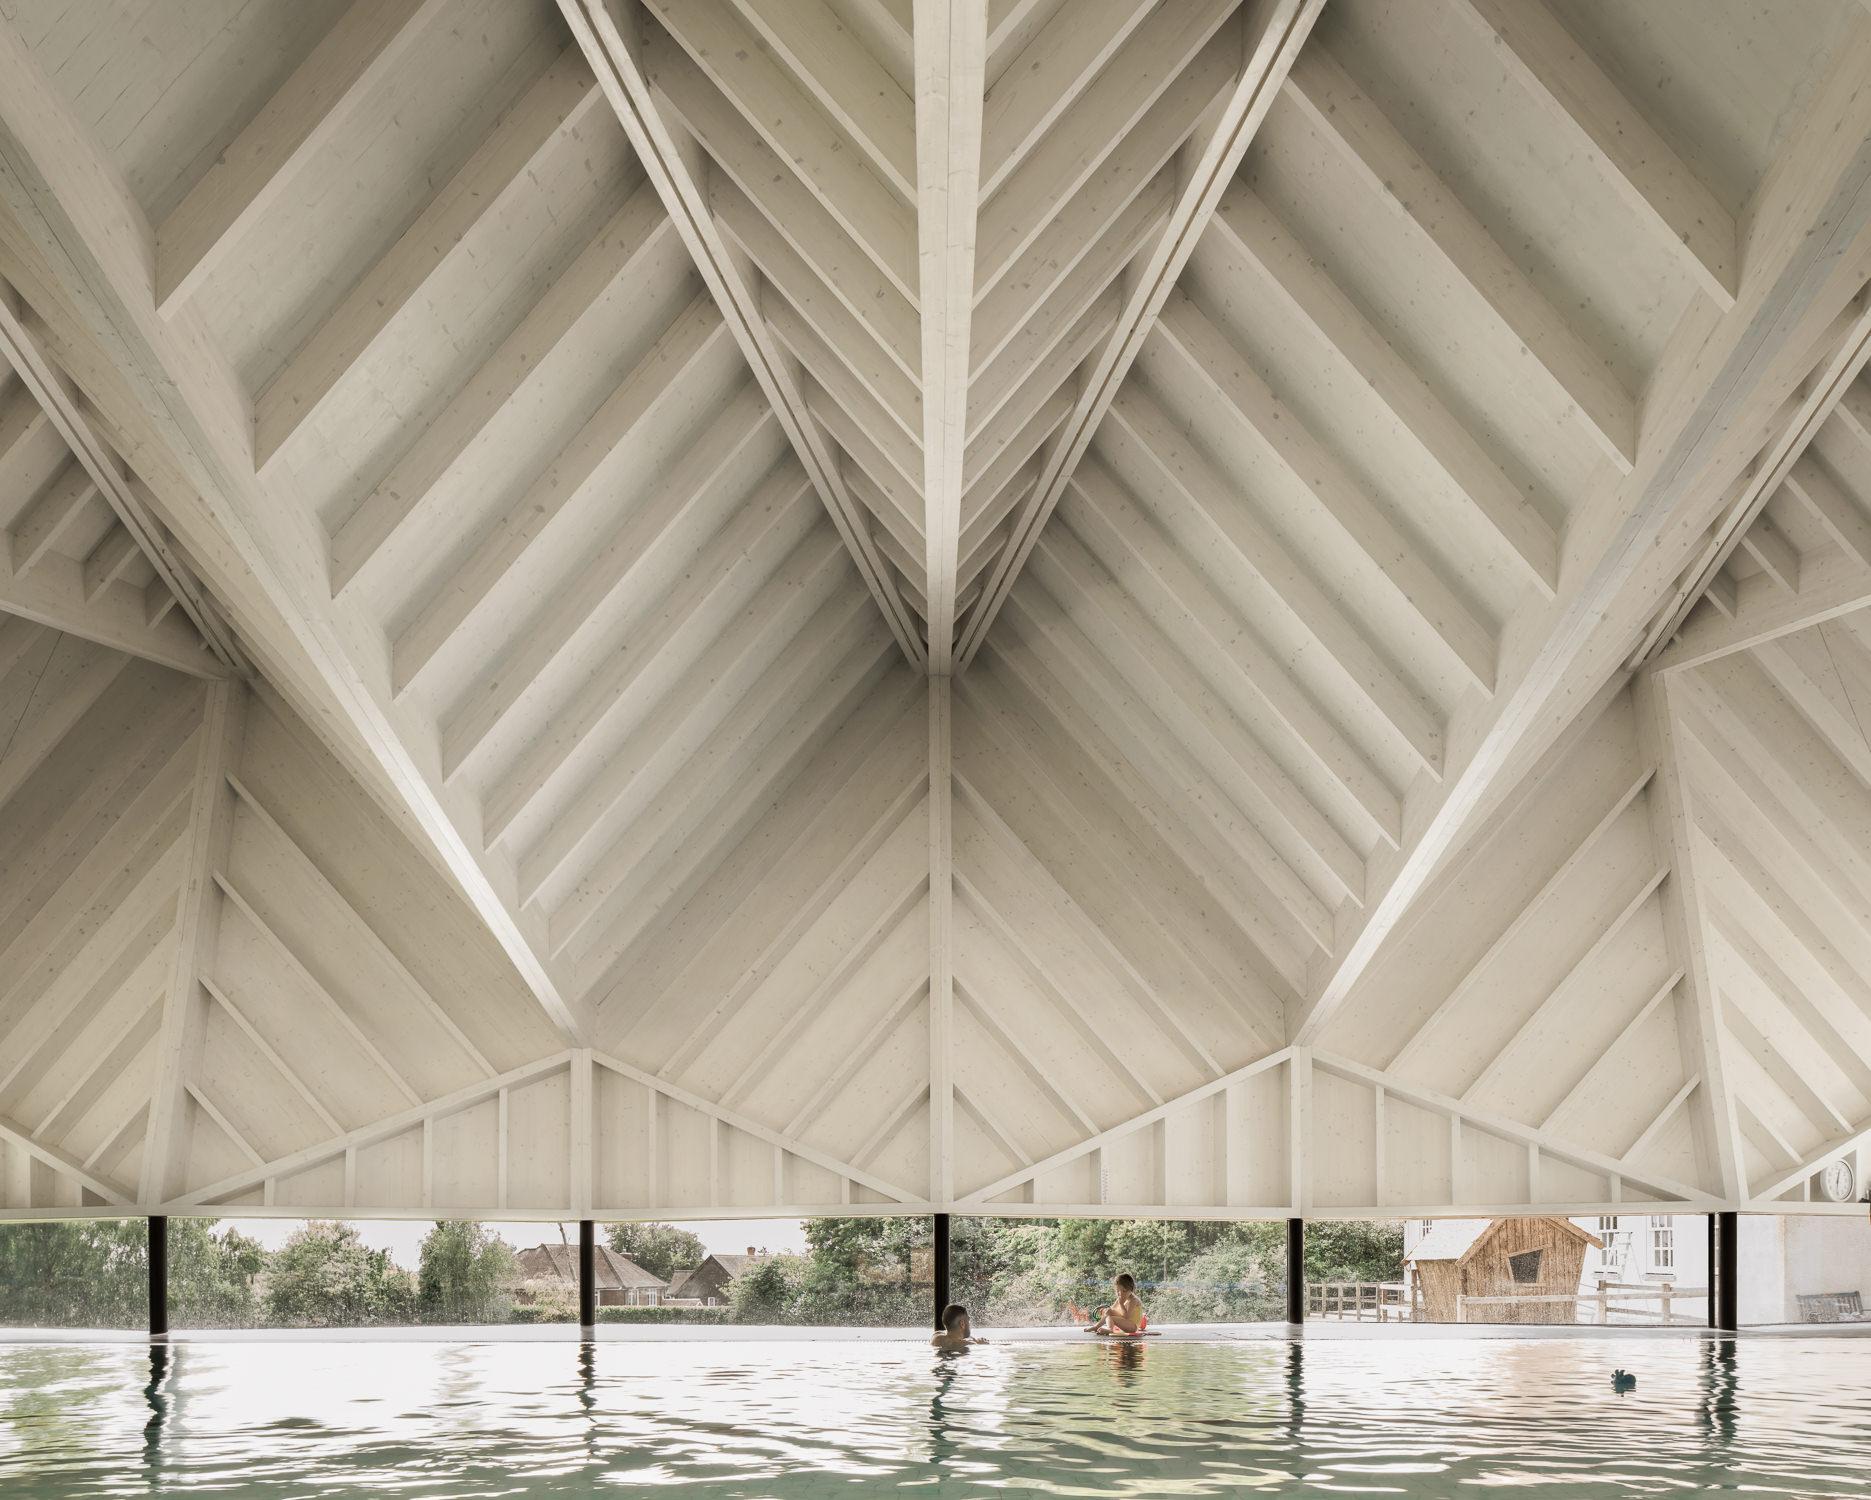 mark-hadden-architecture-photographer-architectuur-interieur-fotografie-london-amsterdam-dma-alfriston-112-Edit.jpg